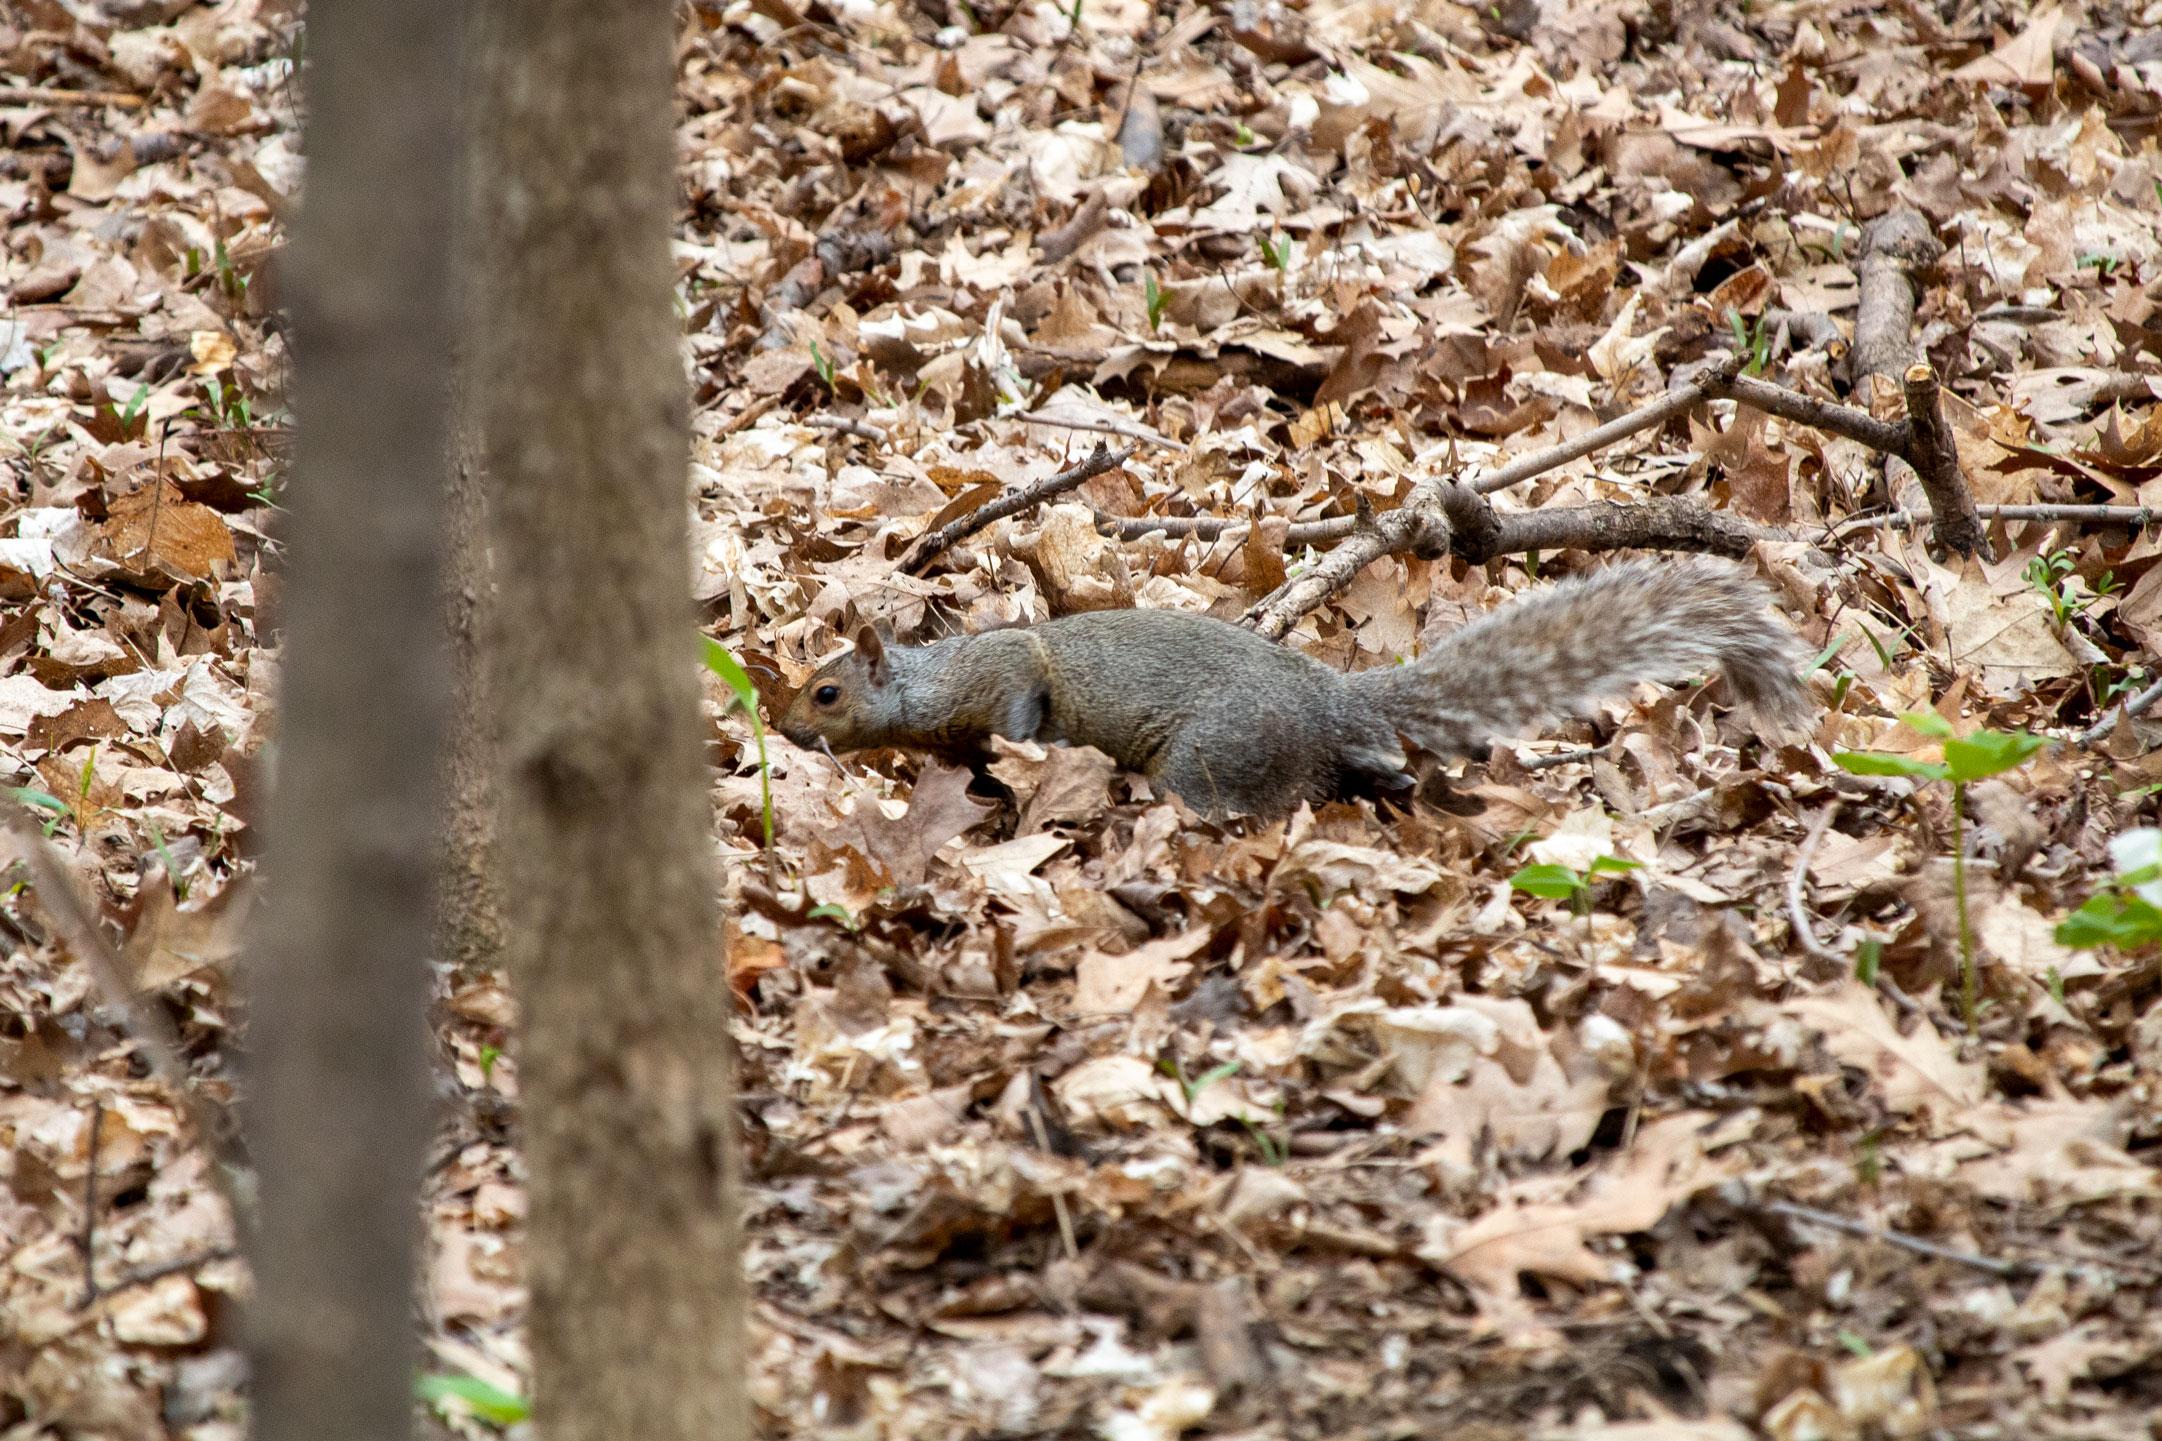 Squirrel sneaking across the forest floor